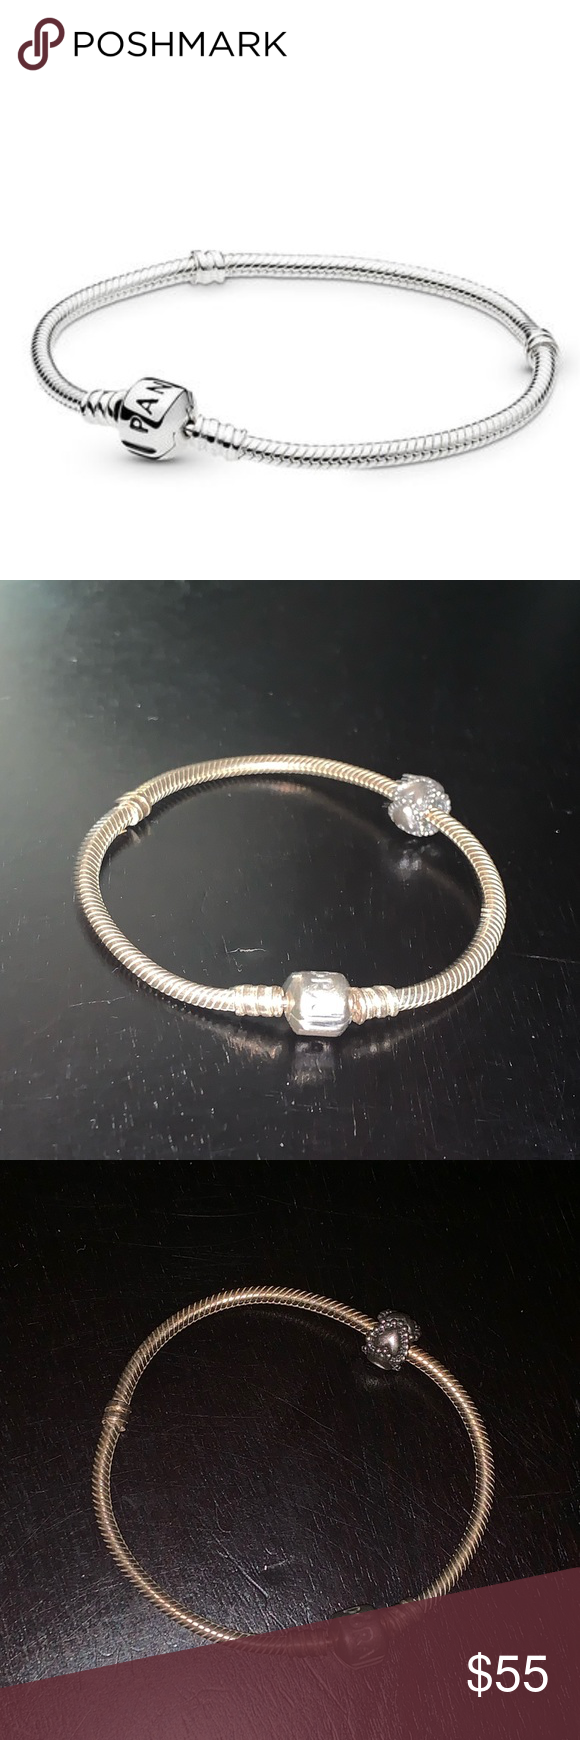 6dac906d4 Pandora Sterling Silver Charm Bracelet Authentic Pandora Bracelet - iconic  standard 925 sterling silver charm bracelet